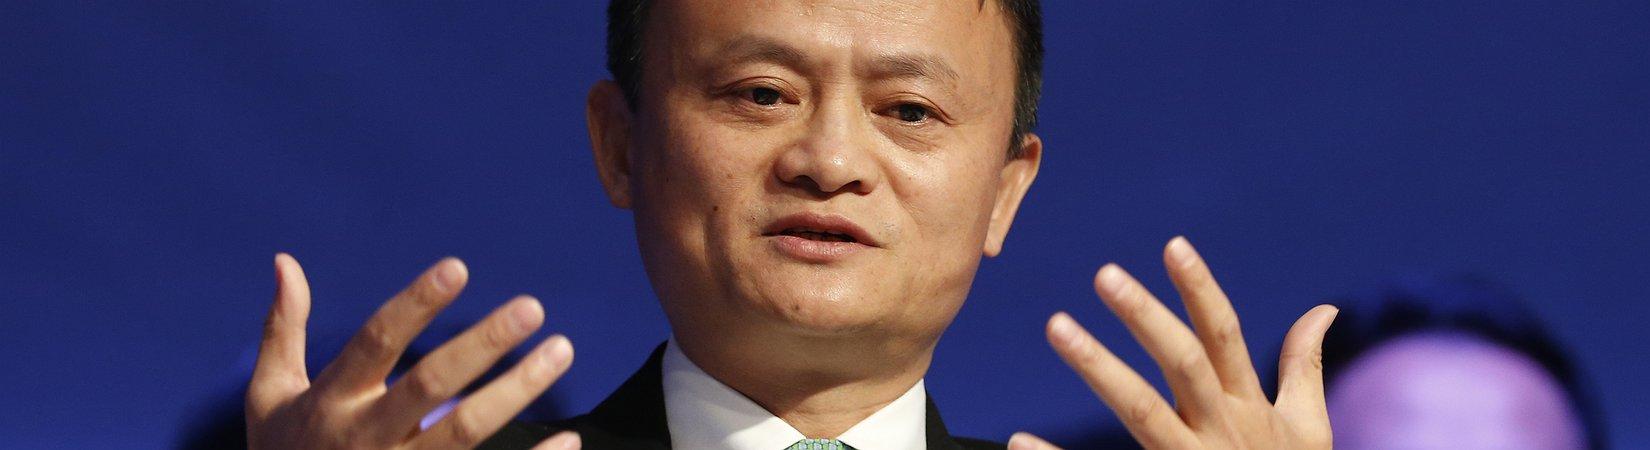 Alibaba takes control of online ticket vendor Damai